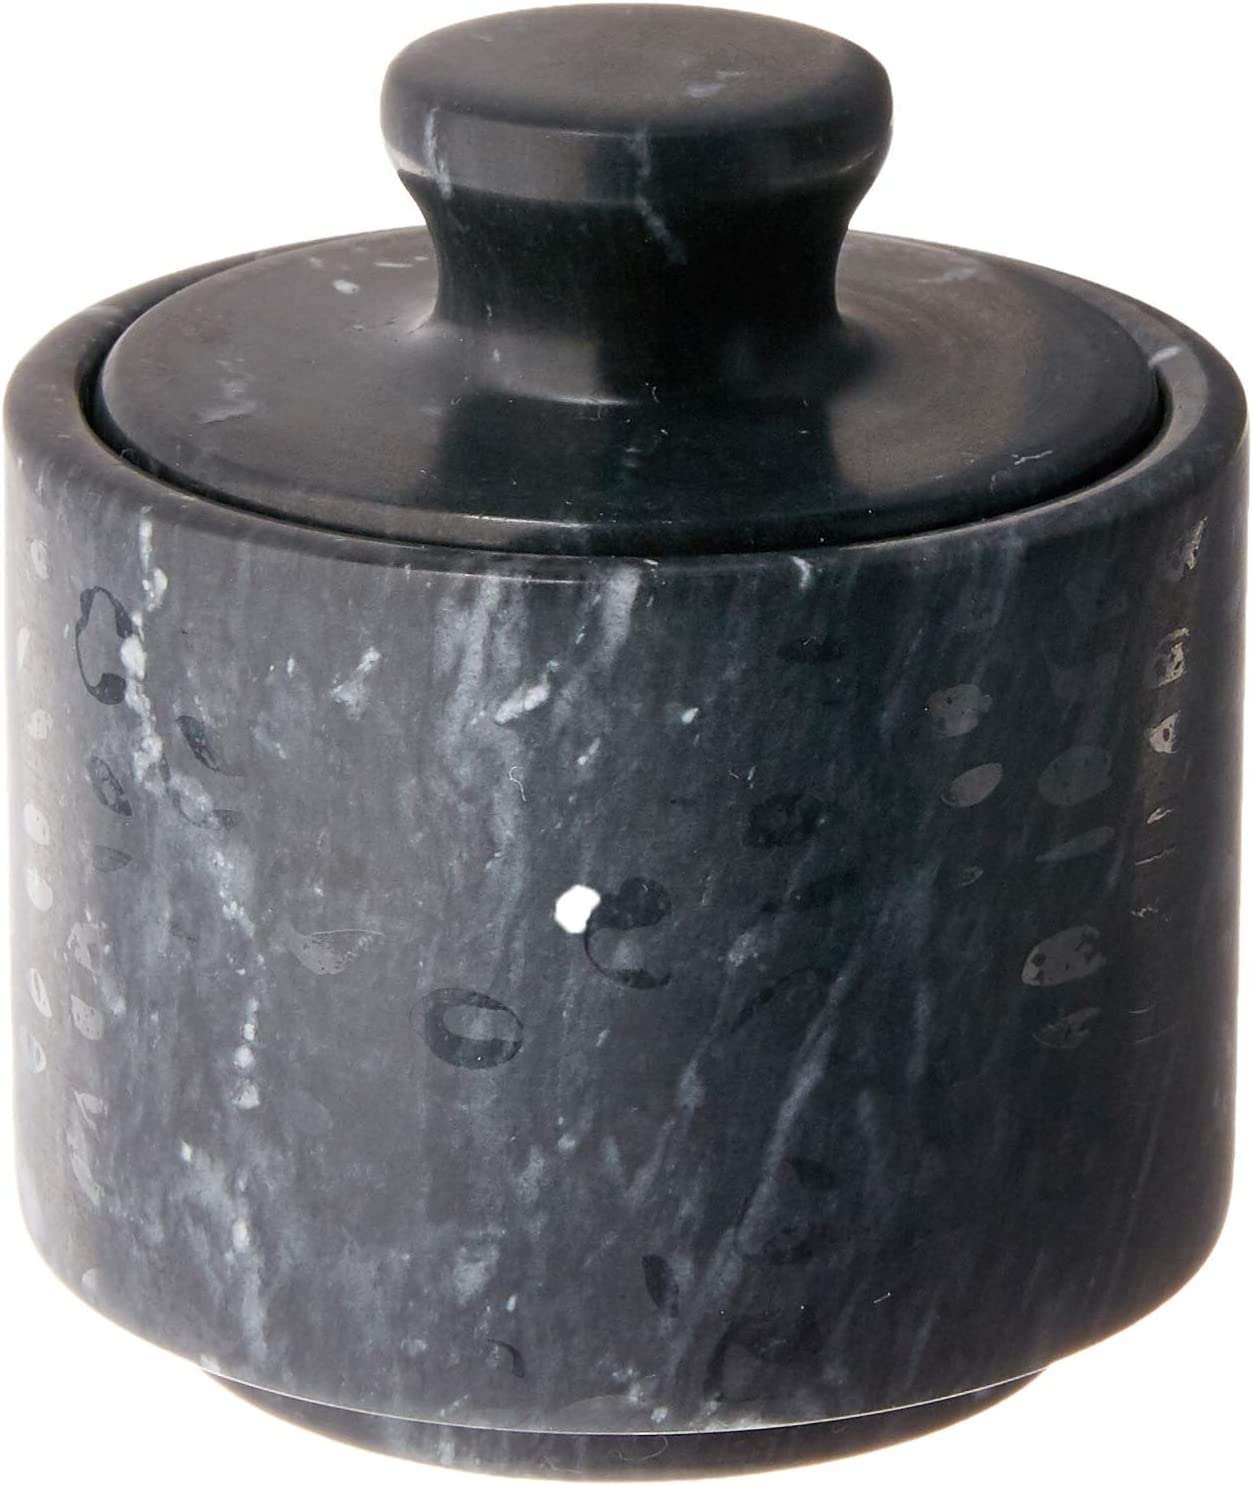 Fox Run 3850 Marble Salt Cellar, Black